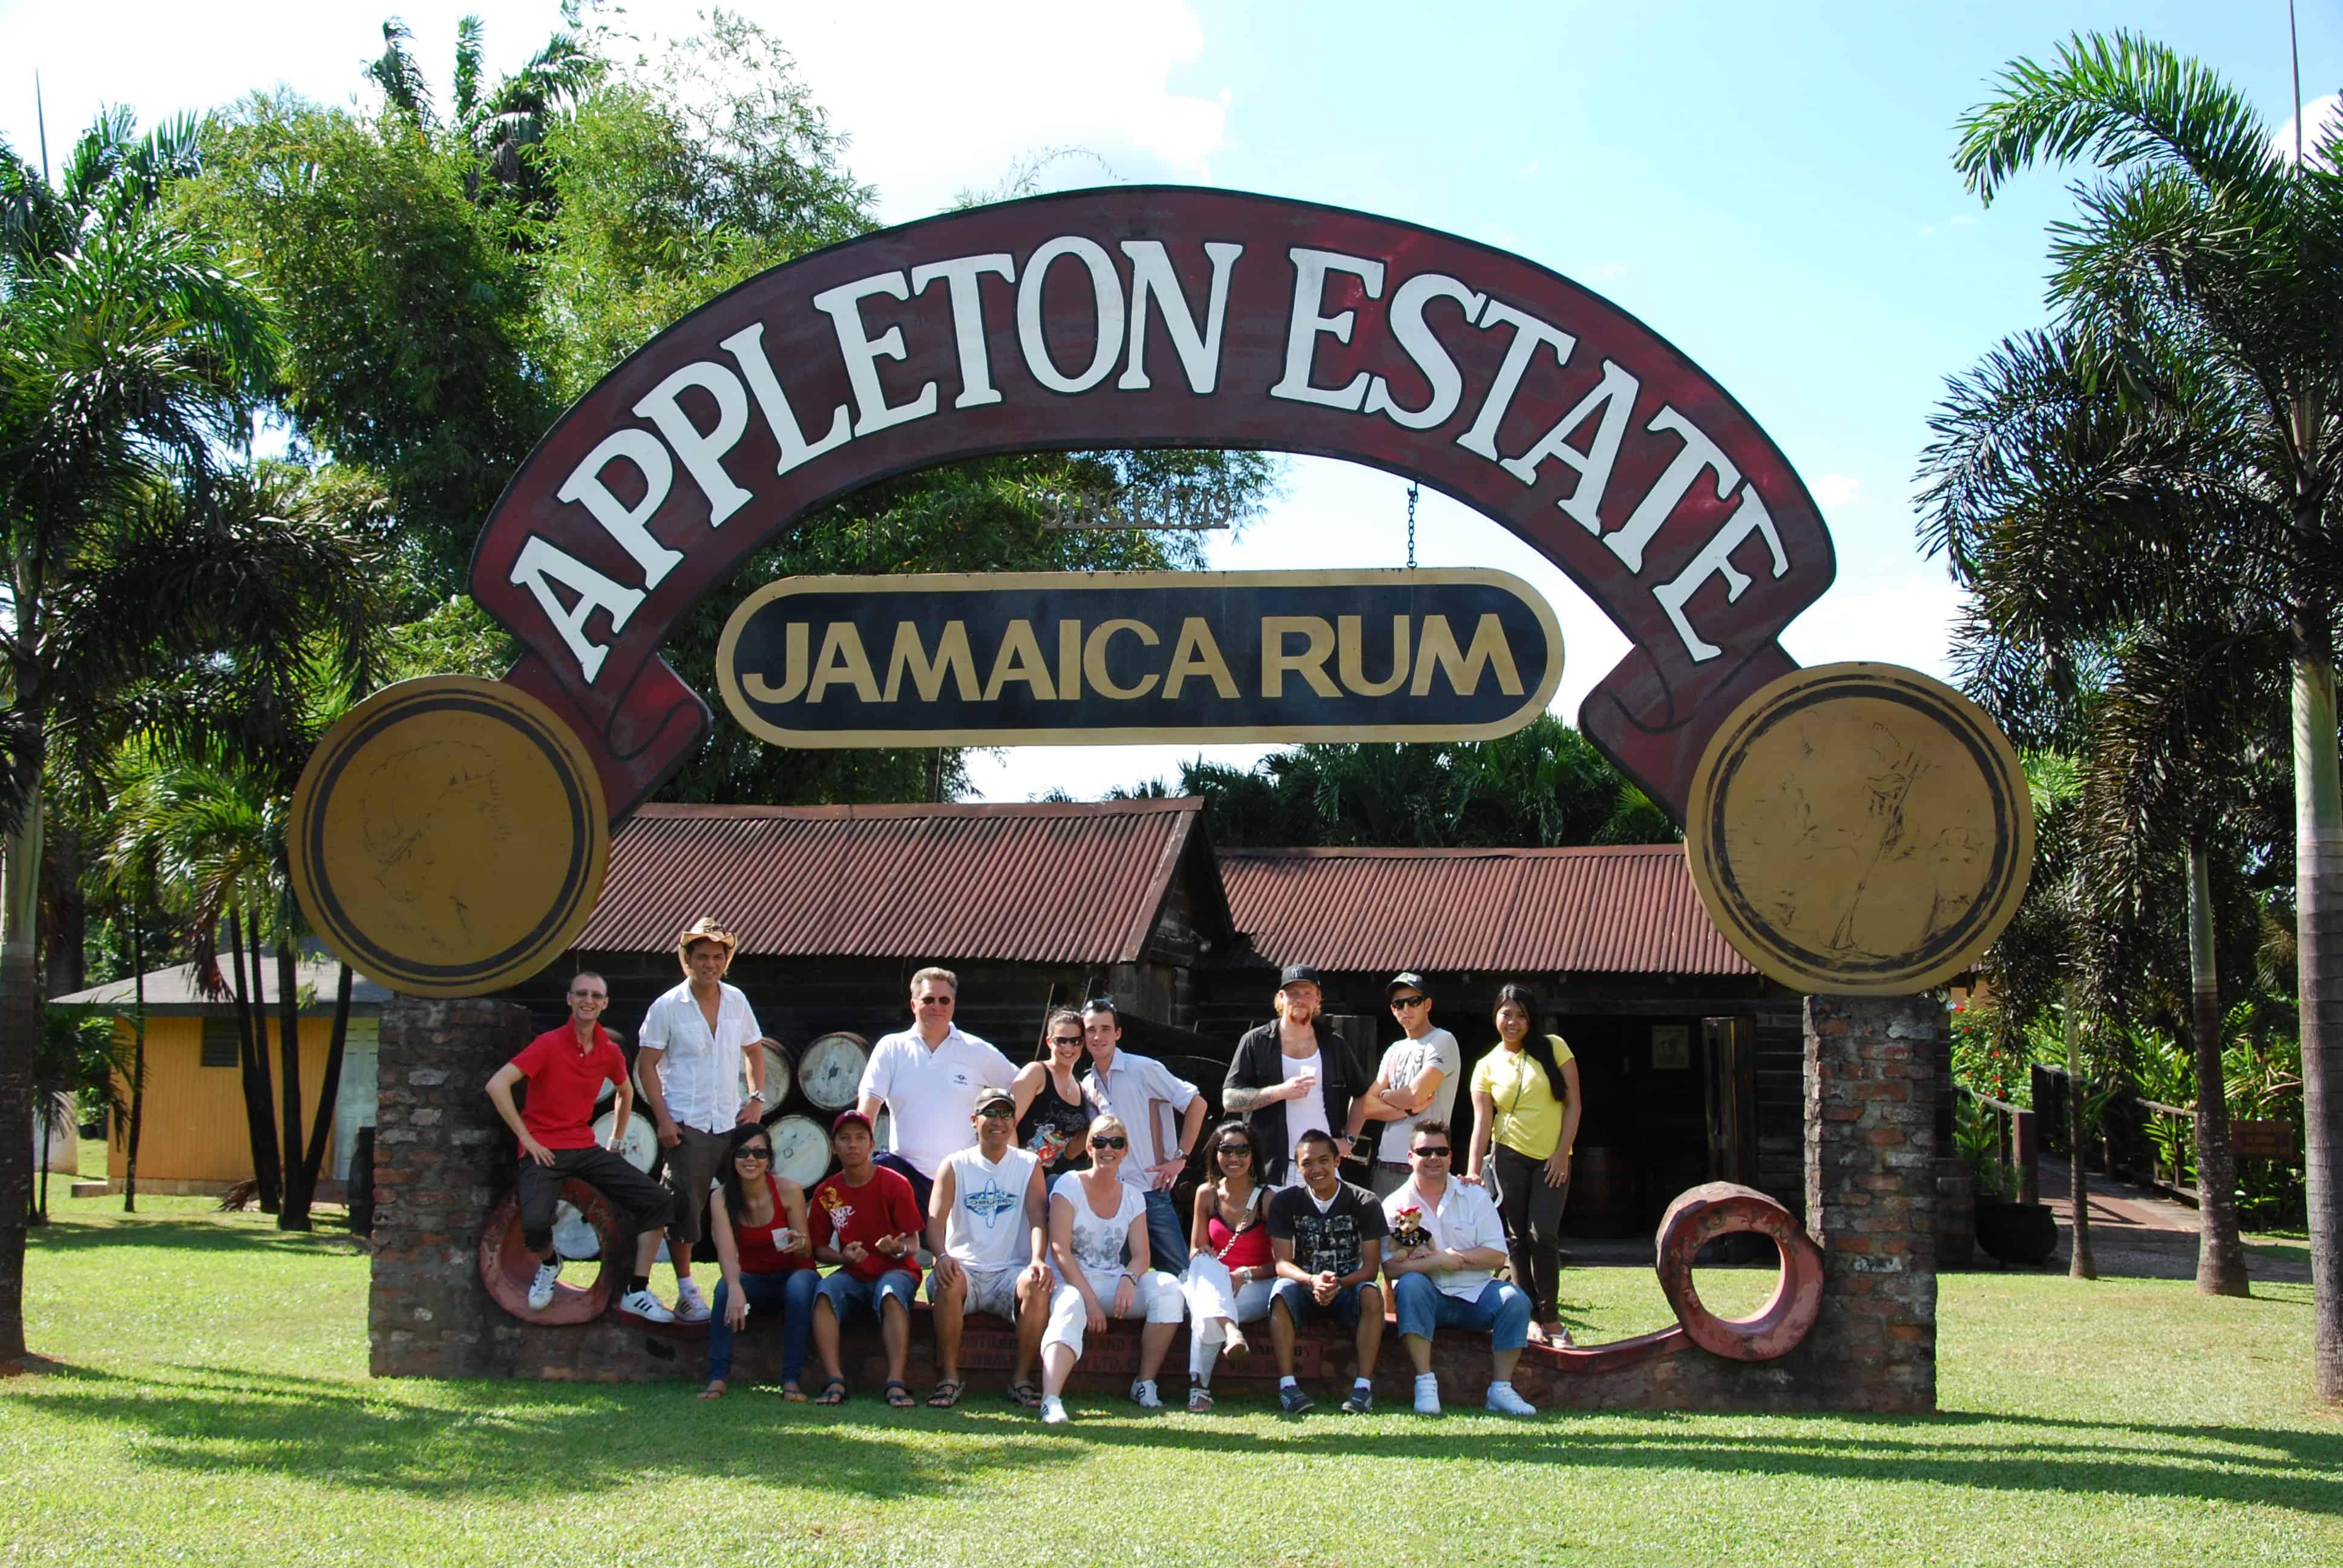 00_Gruppenbild-Appleton-Estate-Jamaica-Rum-Jamaika